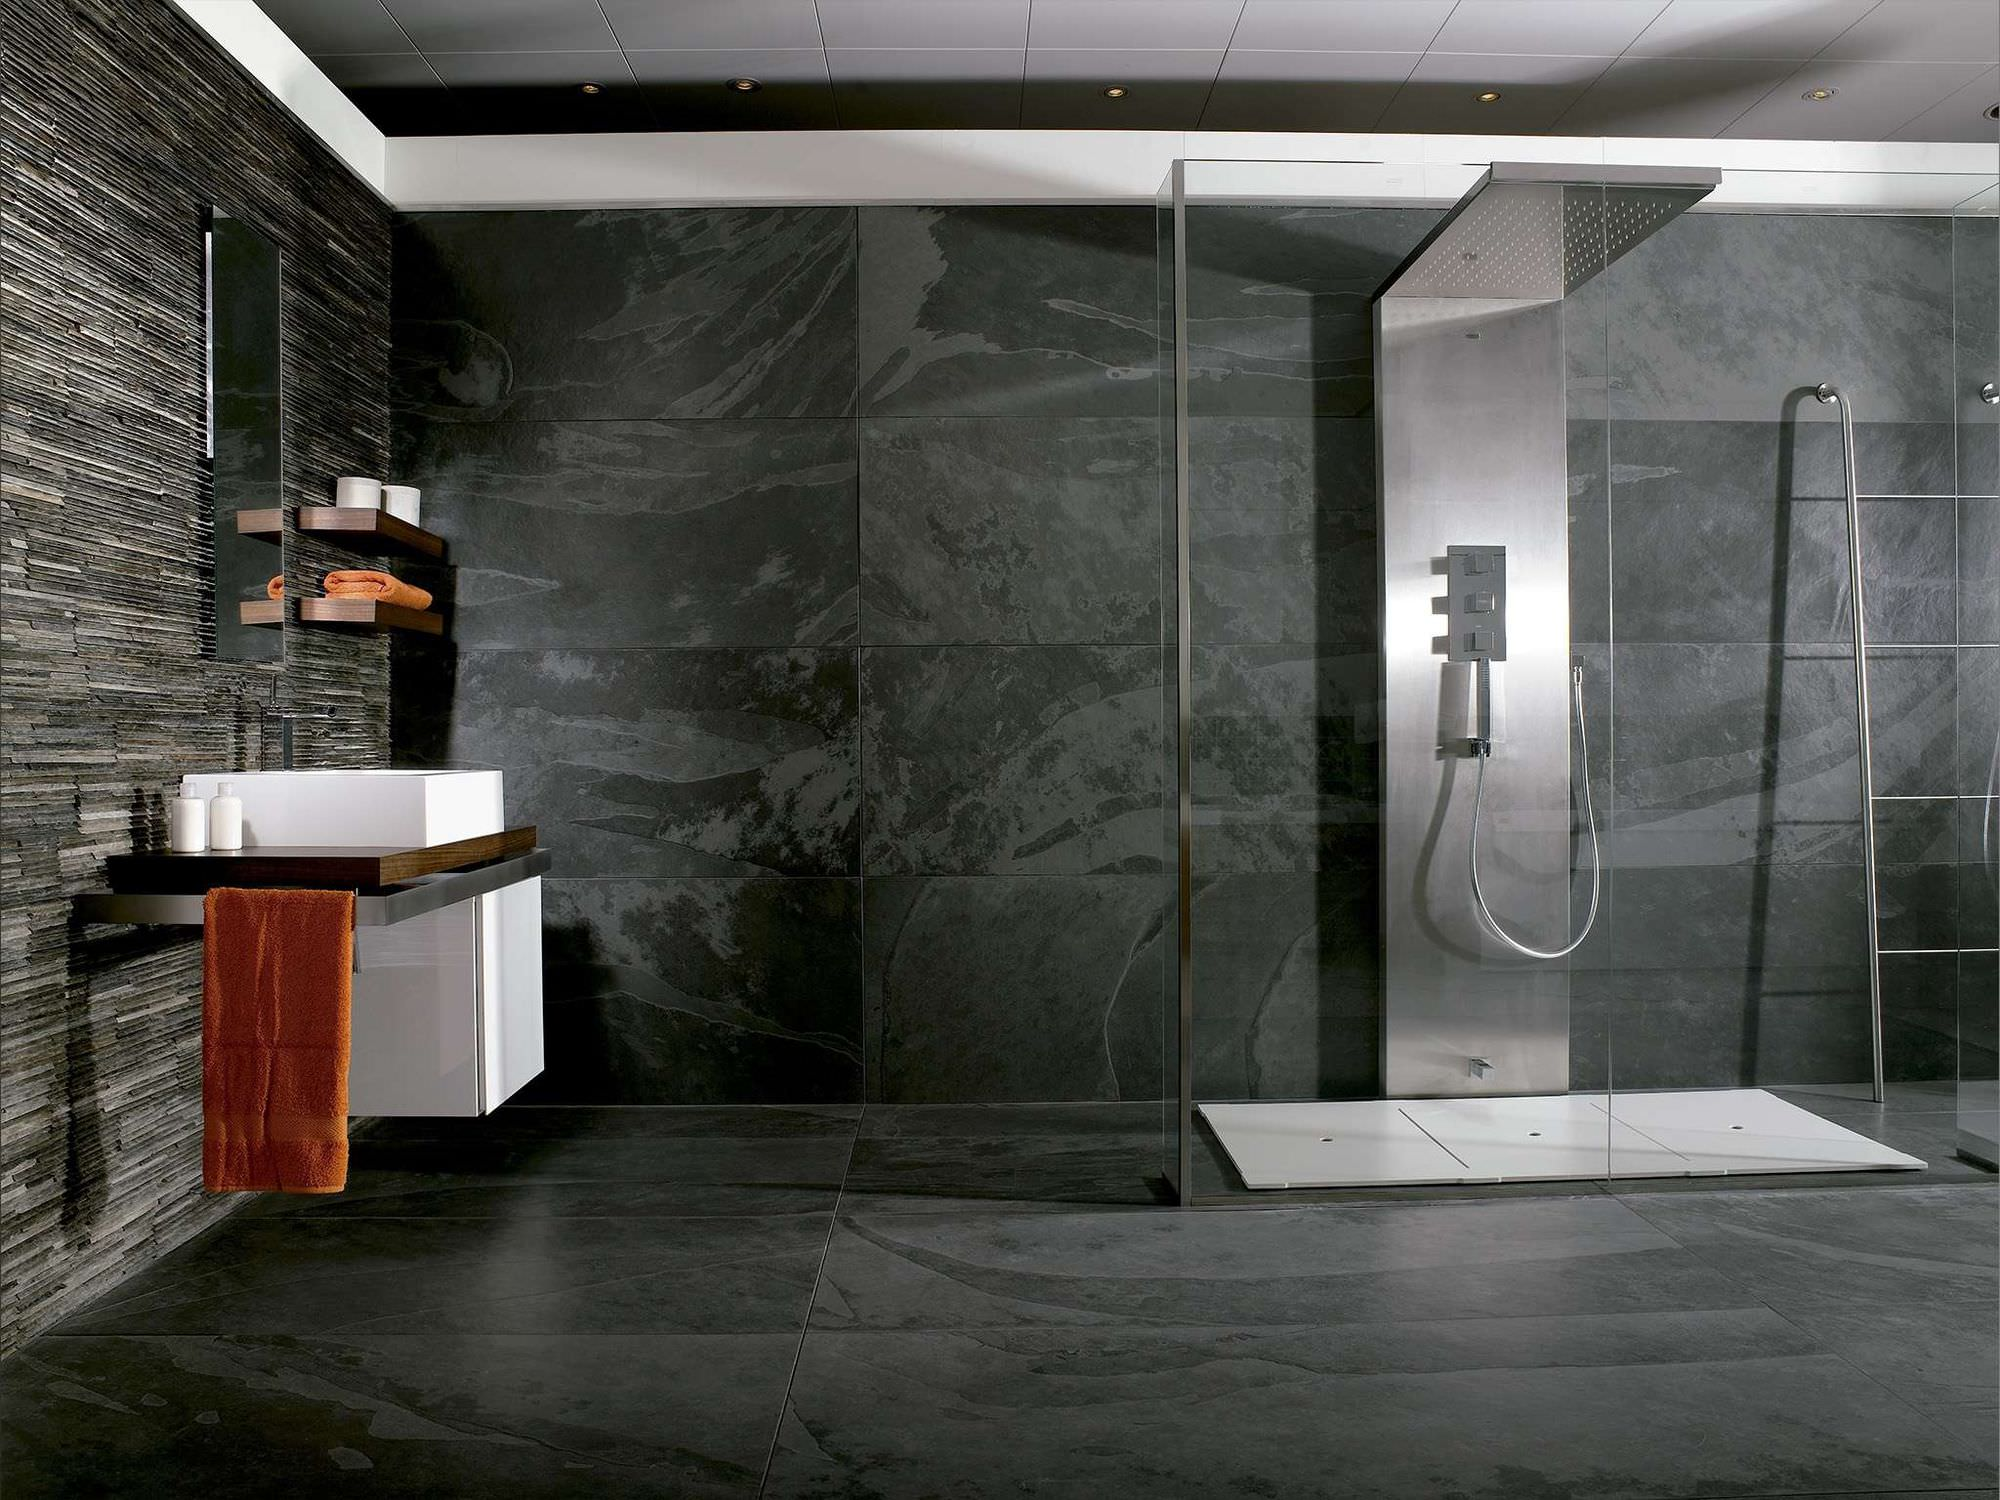 Innenraum-Fliesen / Badezimmer / Wand / Schiefer - PATAGONIA ...